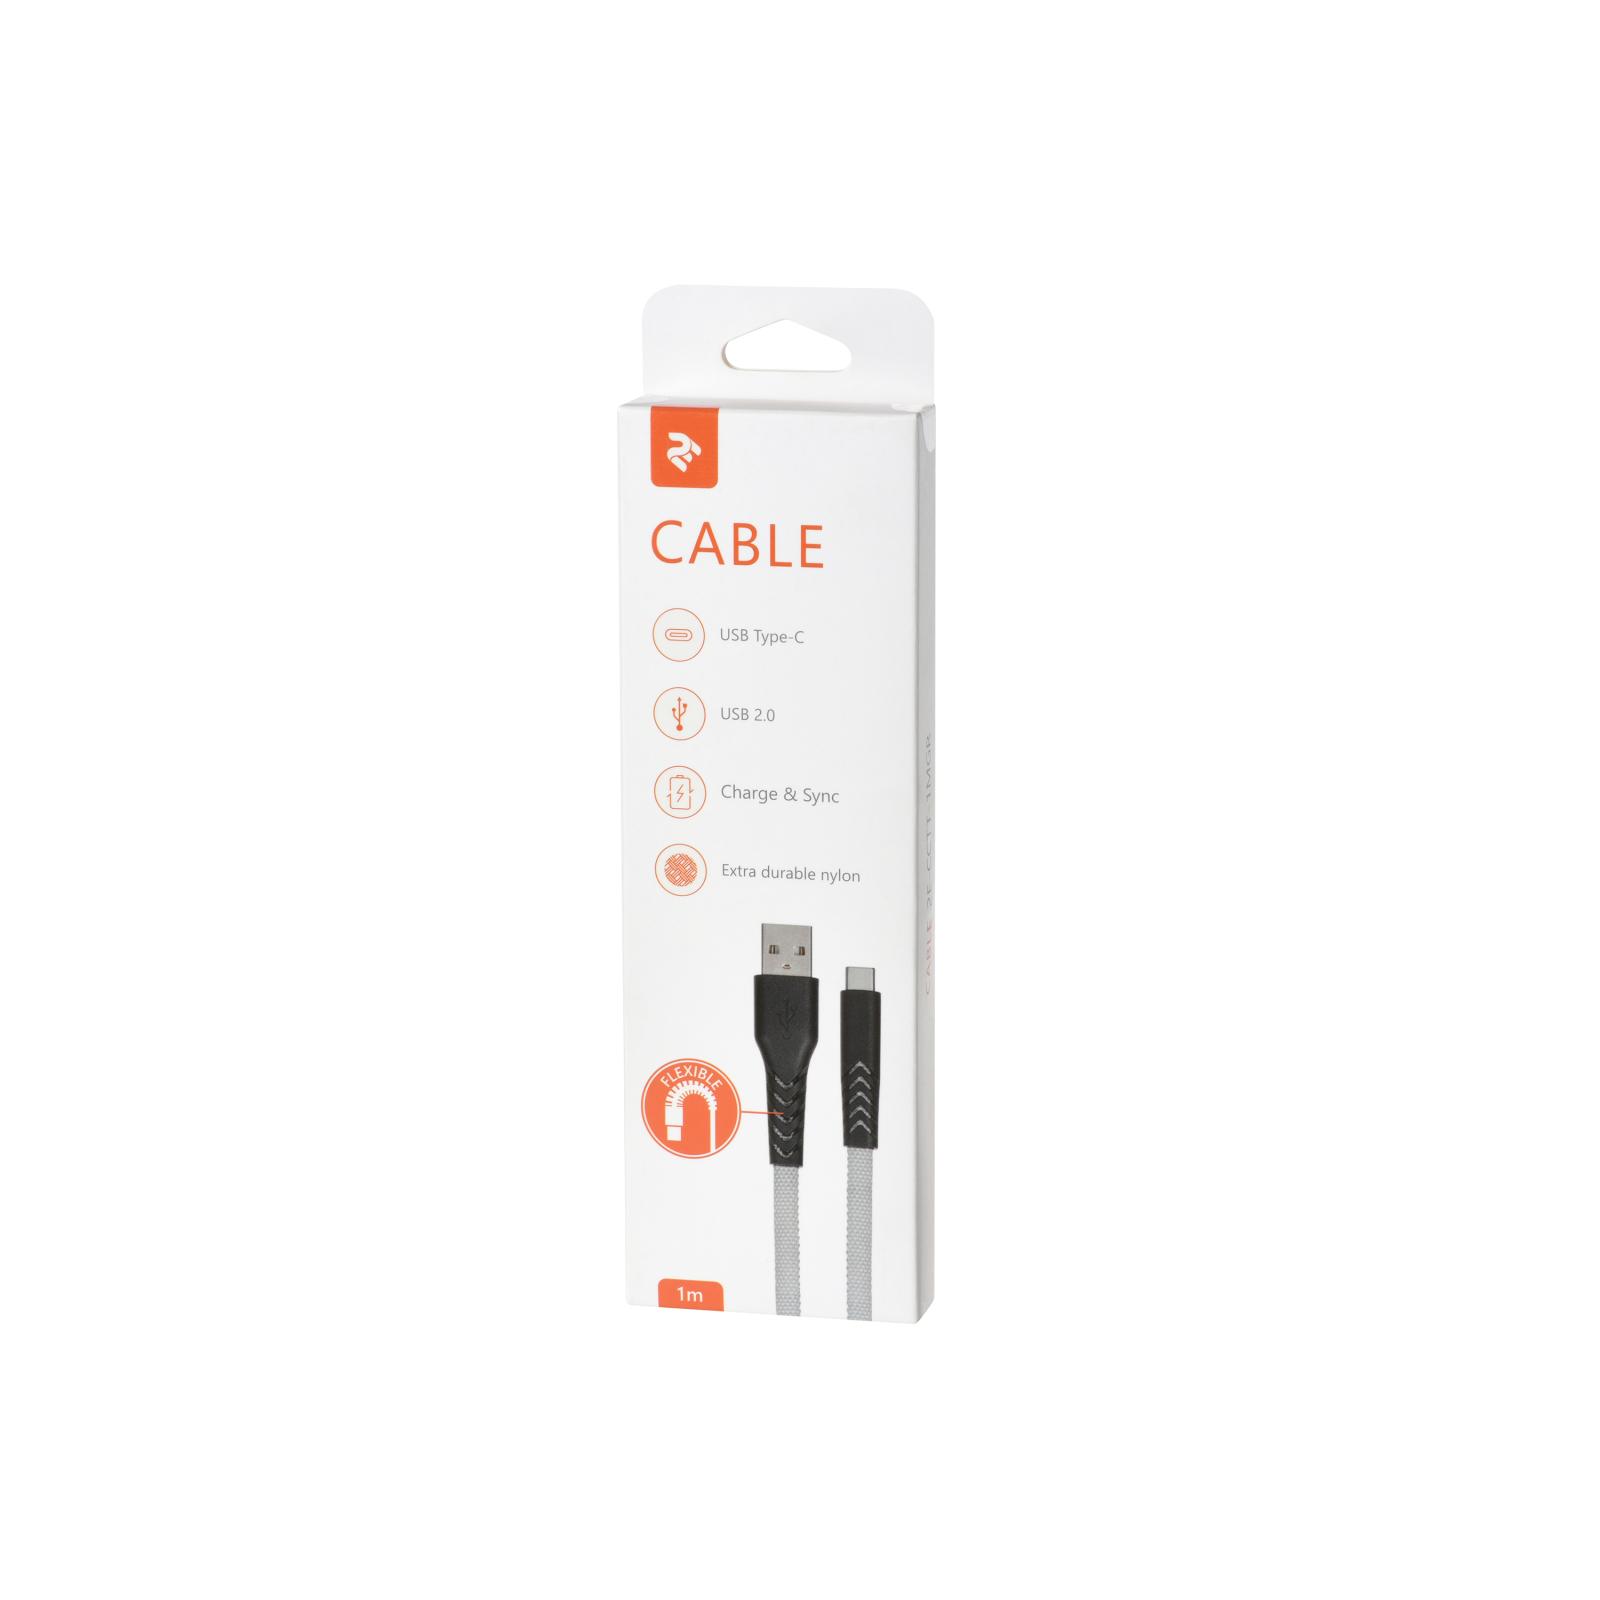 Дата кабель USB 2.0 AM to Type-C 1.0m Flat fabric urban, black/blue 2E (2E-CCTT-1MBL) изображение 4